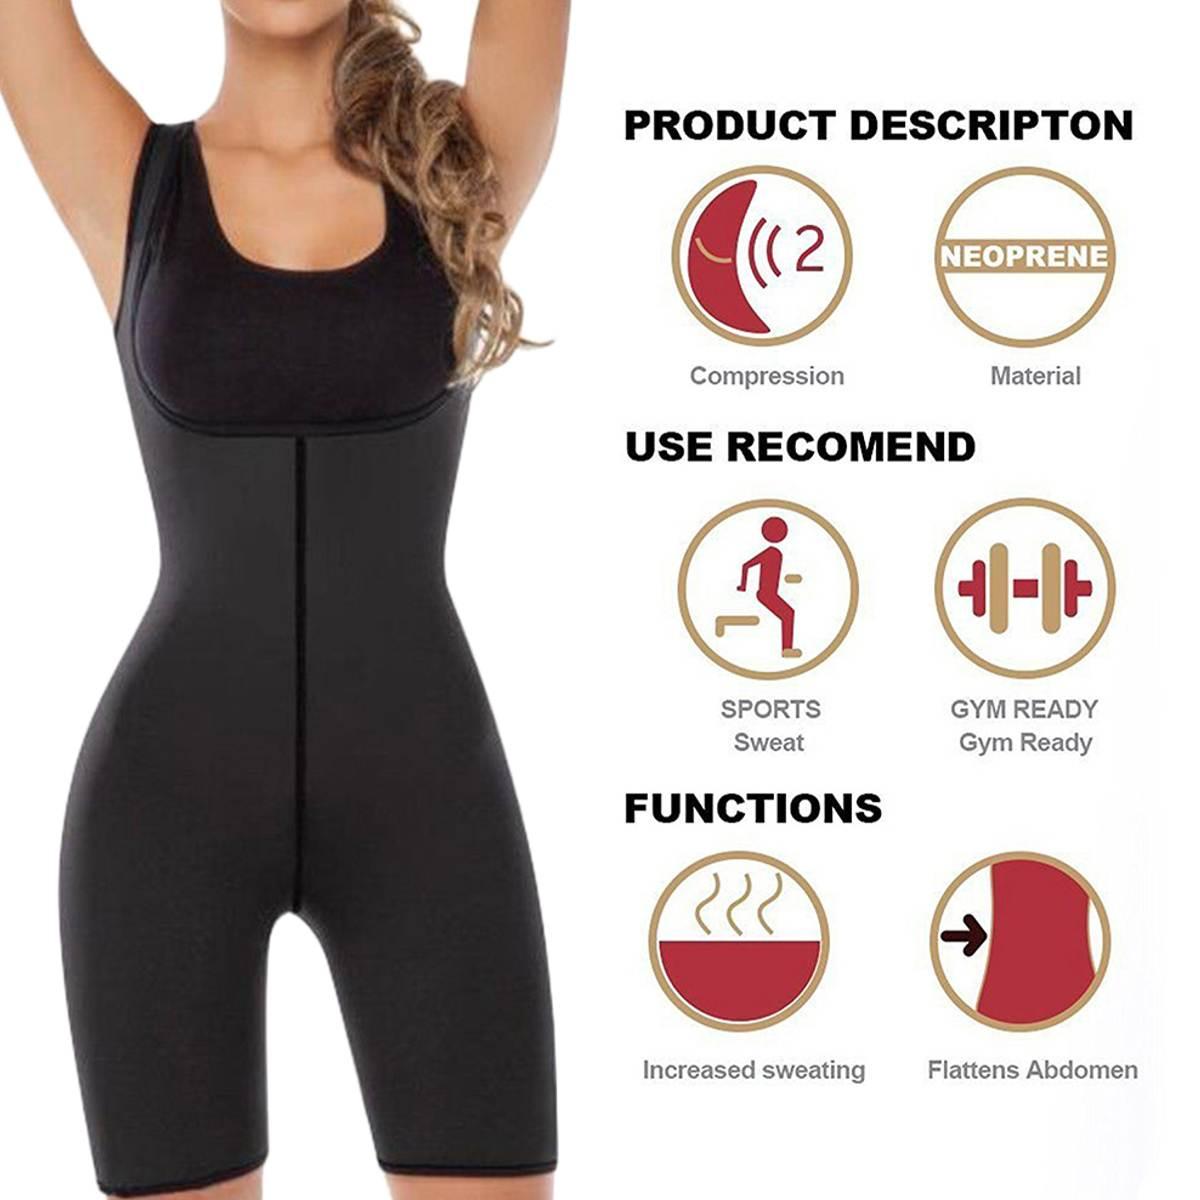 Women Weight Loss Corset Shapewear Full Body Shaper Neoprene Sauna Suit Slimming Burne Tummy Fat Yoga Trainer Sportswear Black